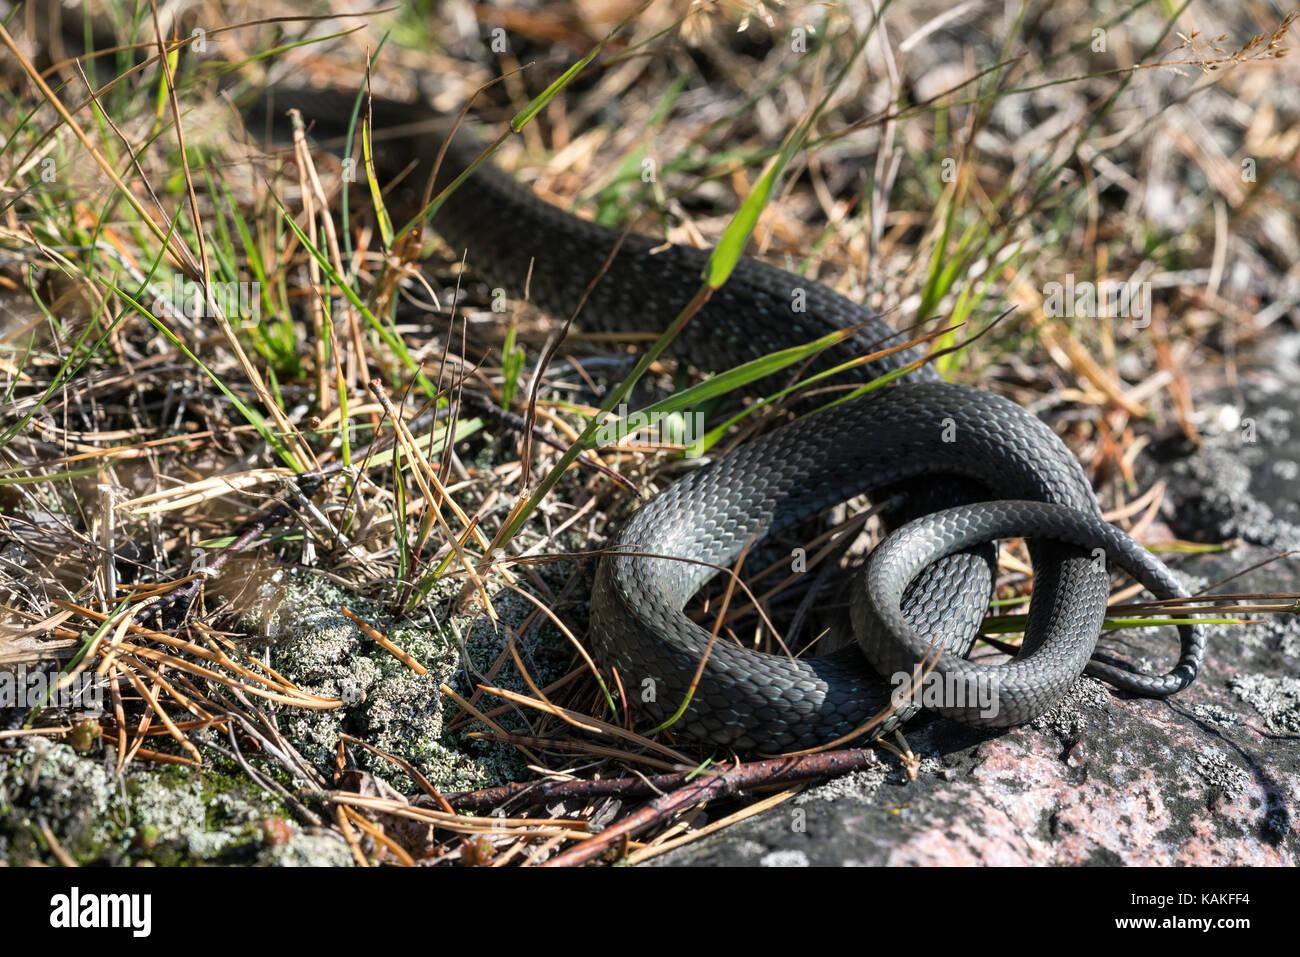 Grass Snake Leaving After Sighting The Photographer, Kirkkonummi  Archipelago, Finland, Europe, EU